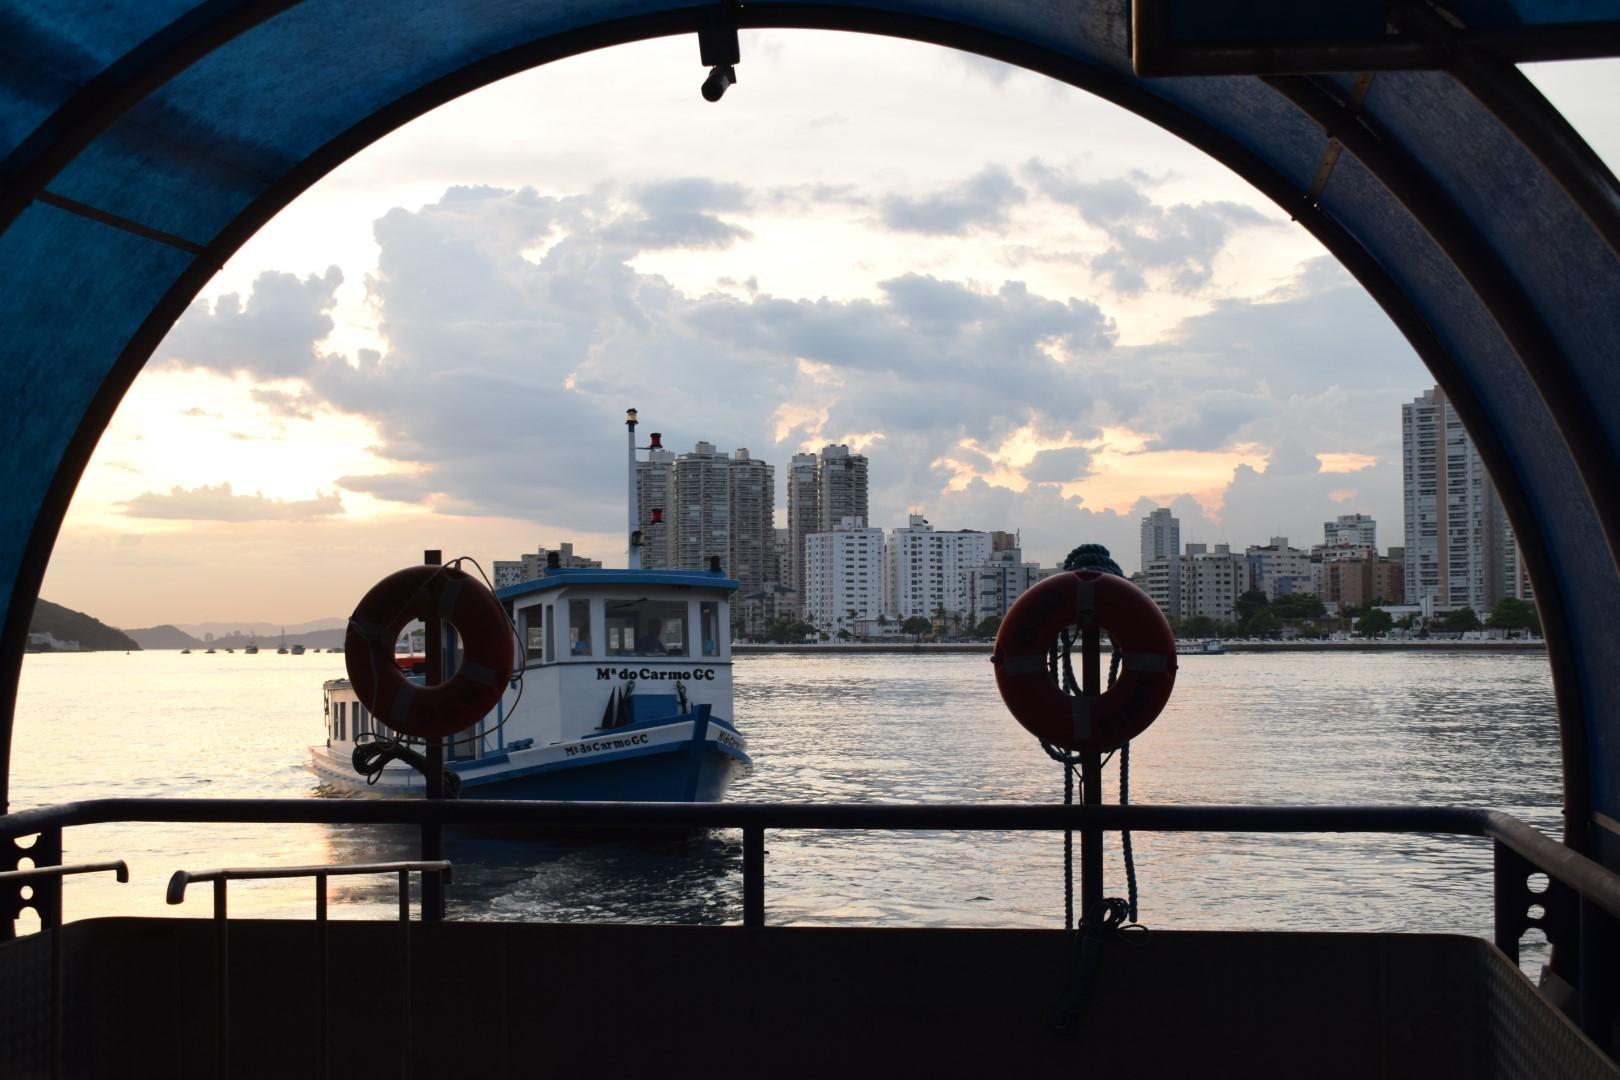 Balsa Santos-Guarujá